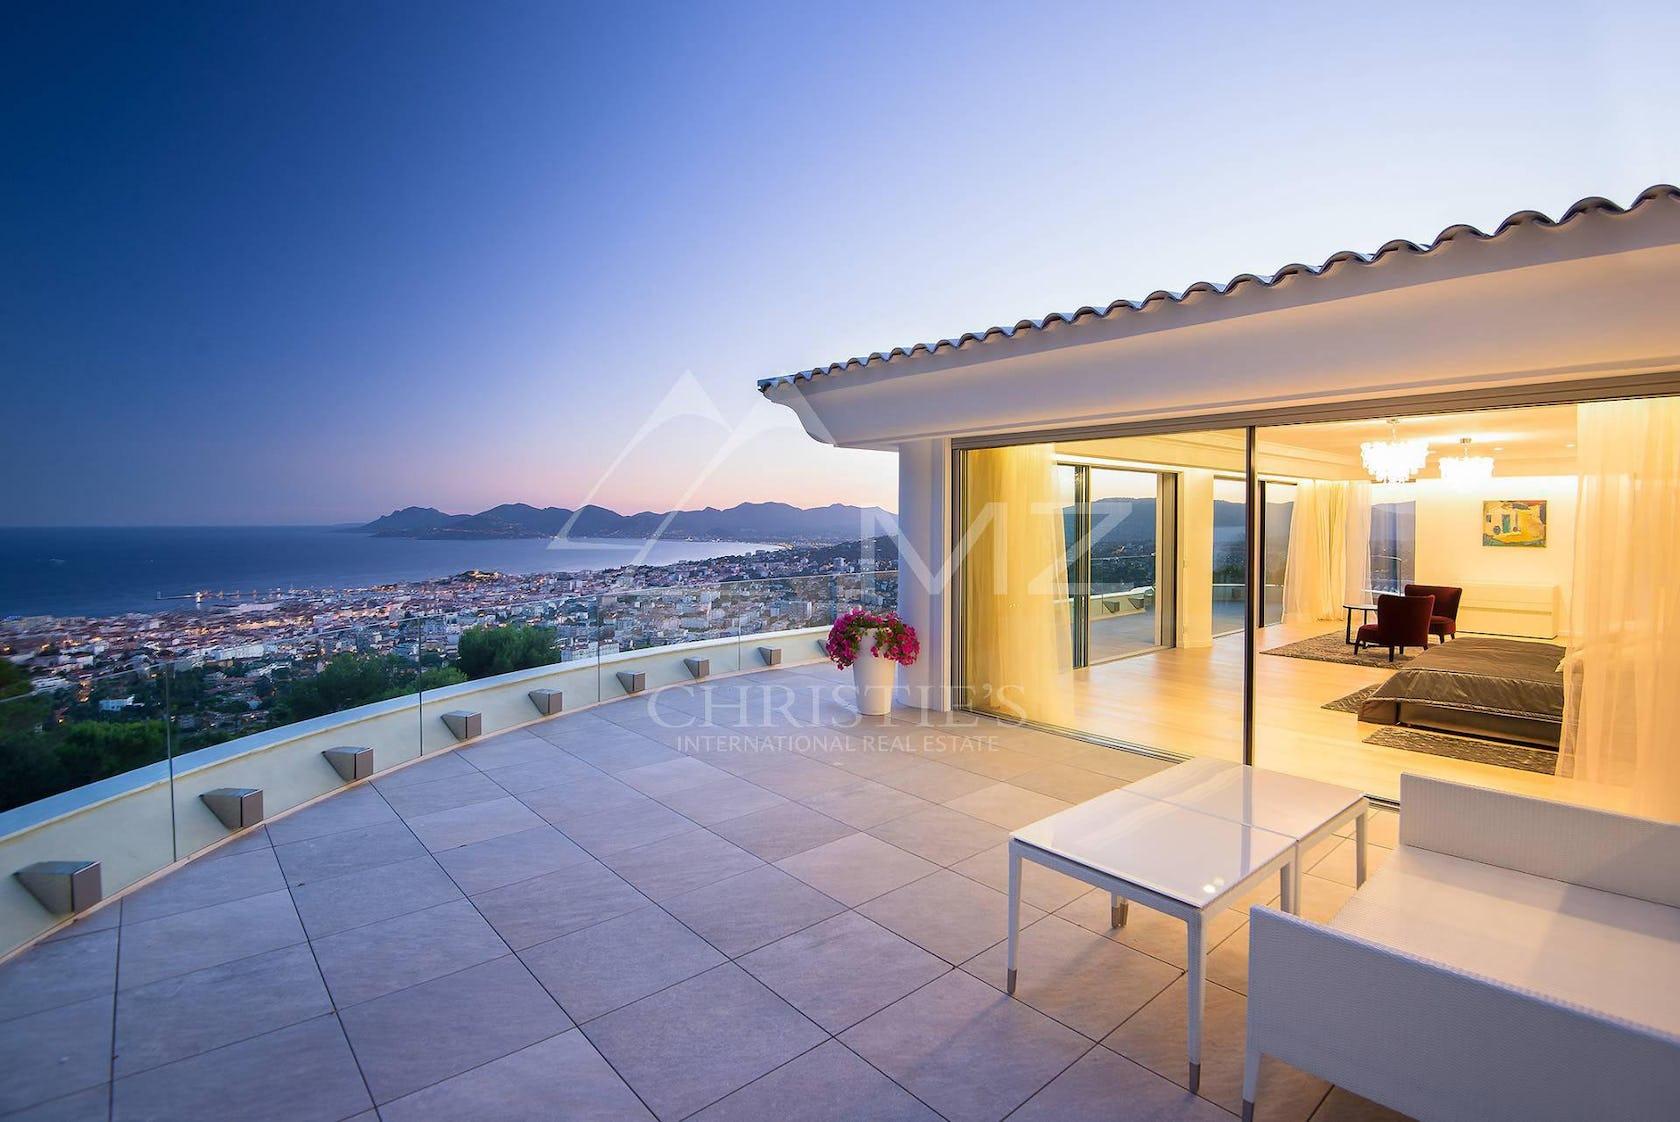 housing building flooring interior design indoors villa house